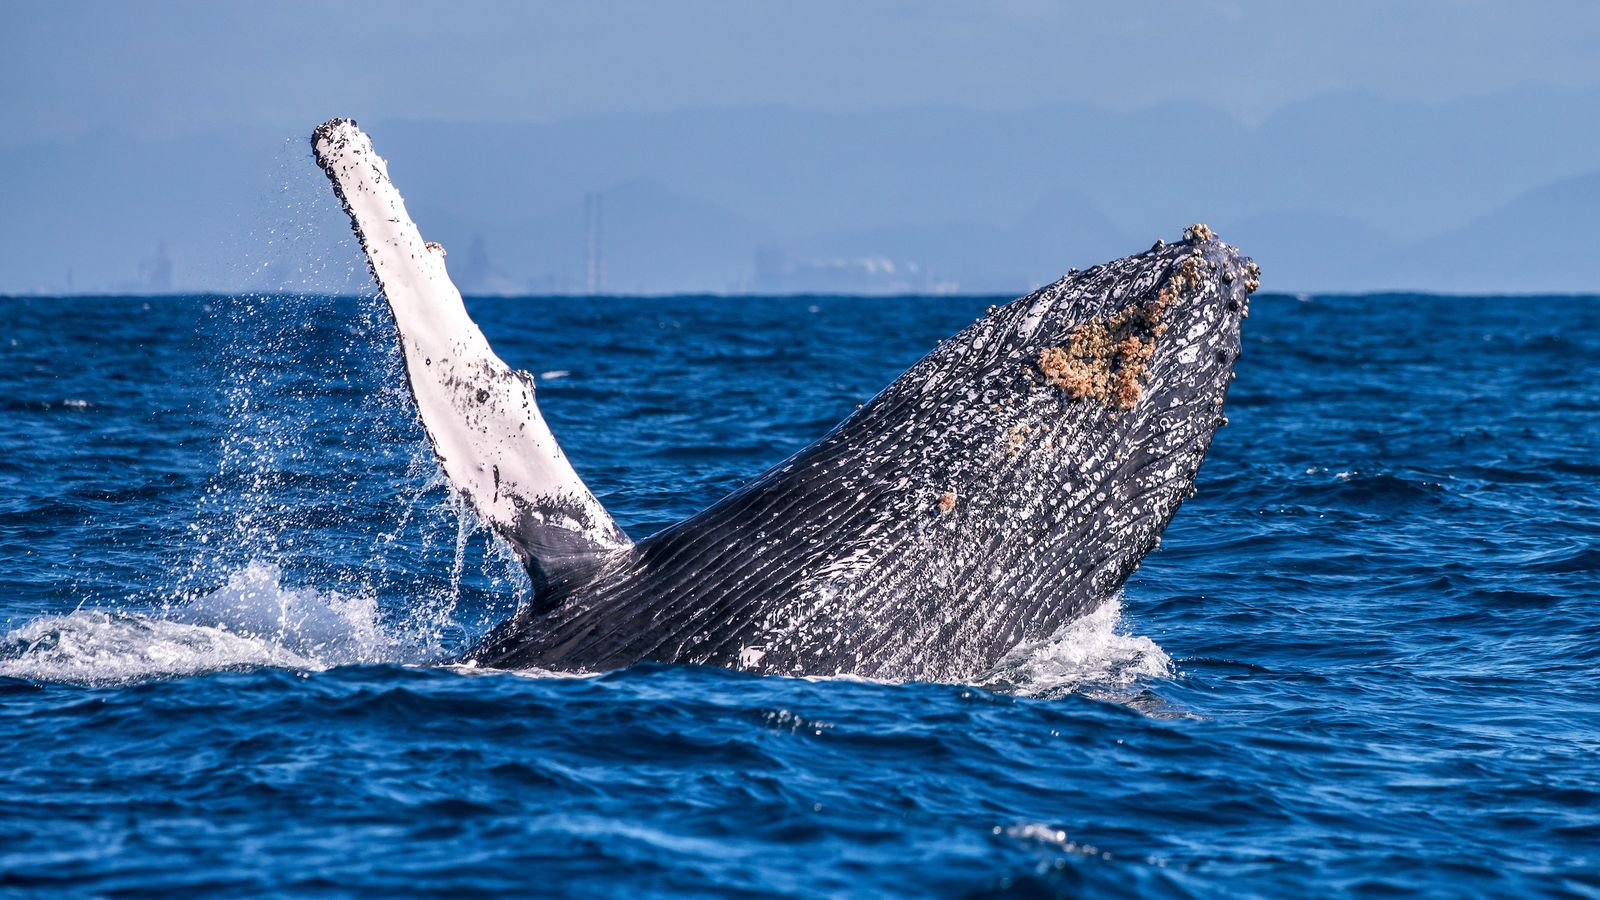 salto-da-baleia-jubarte